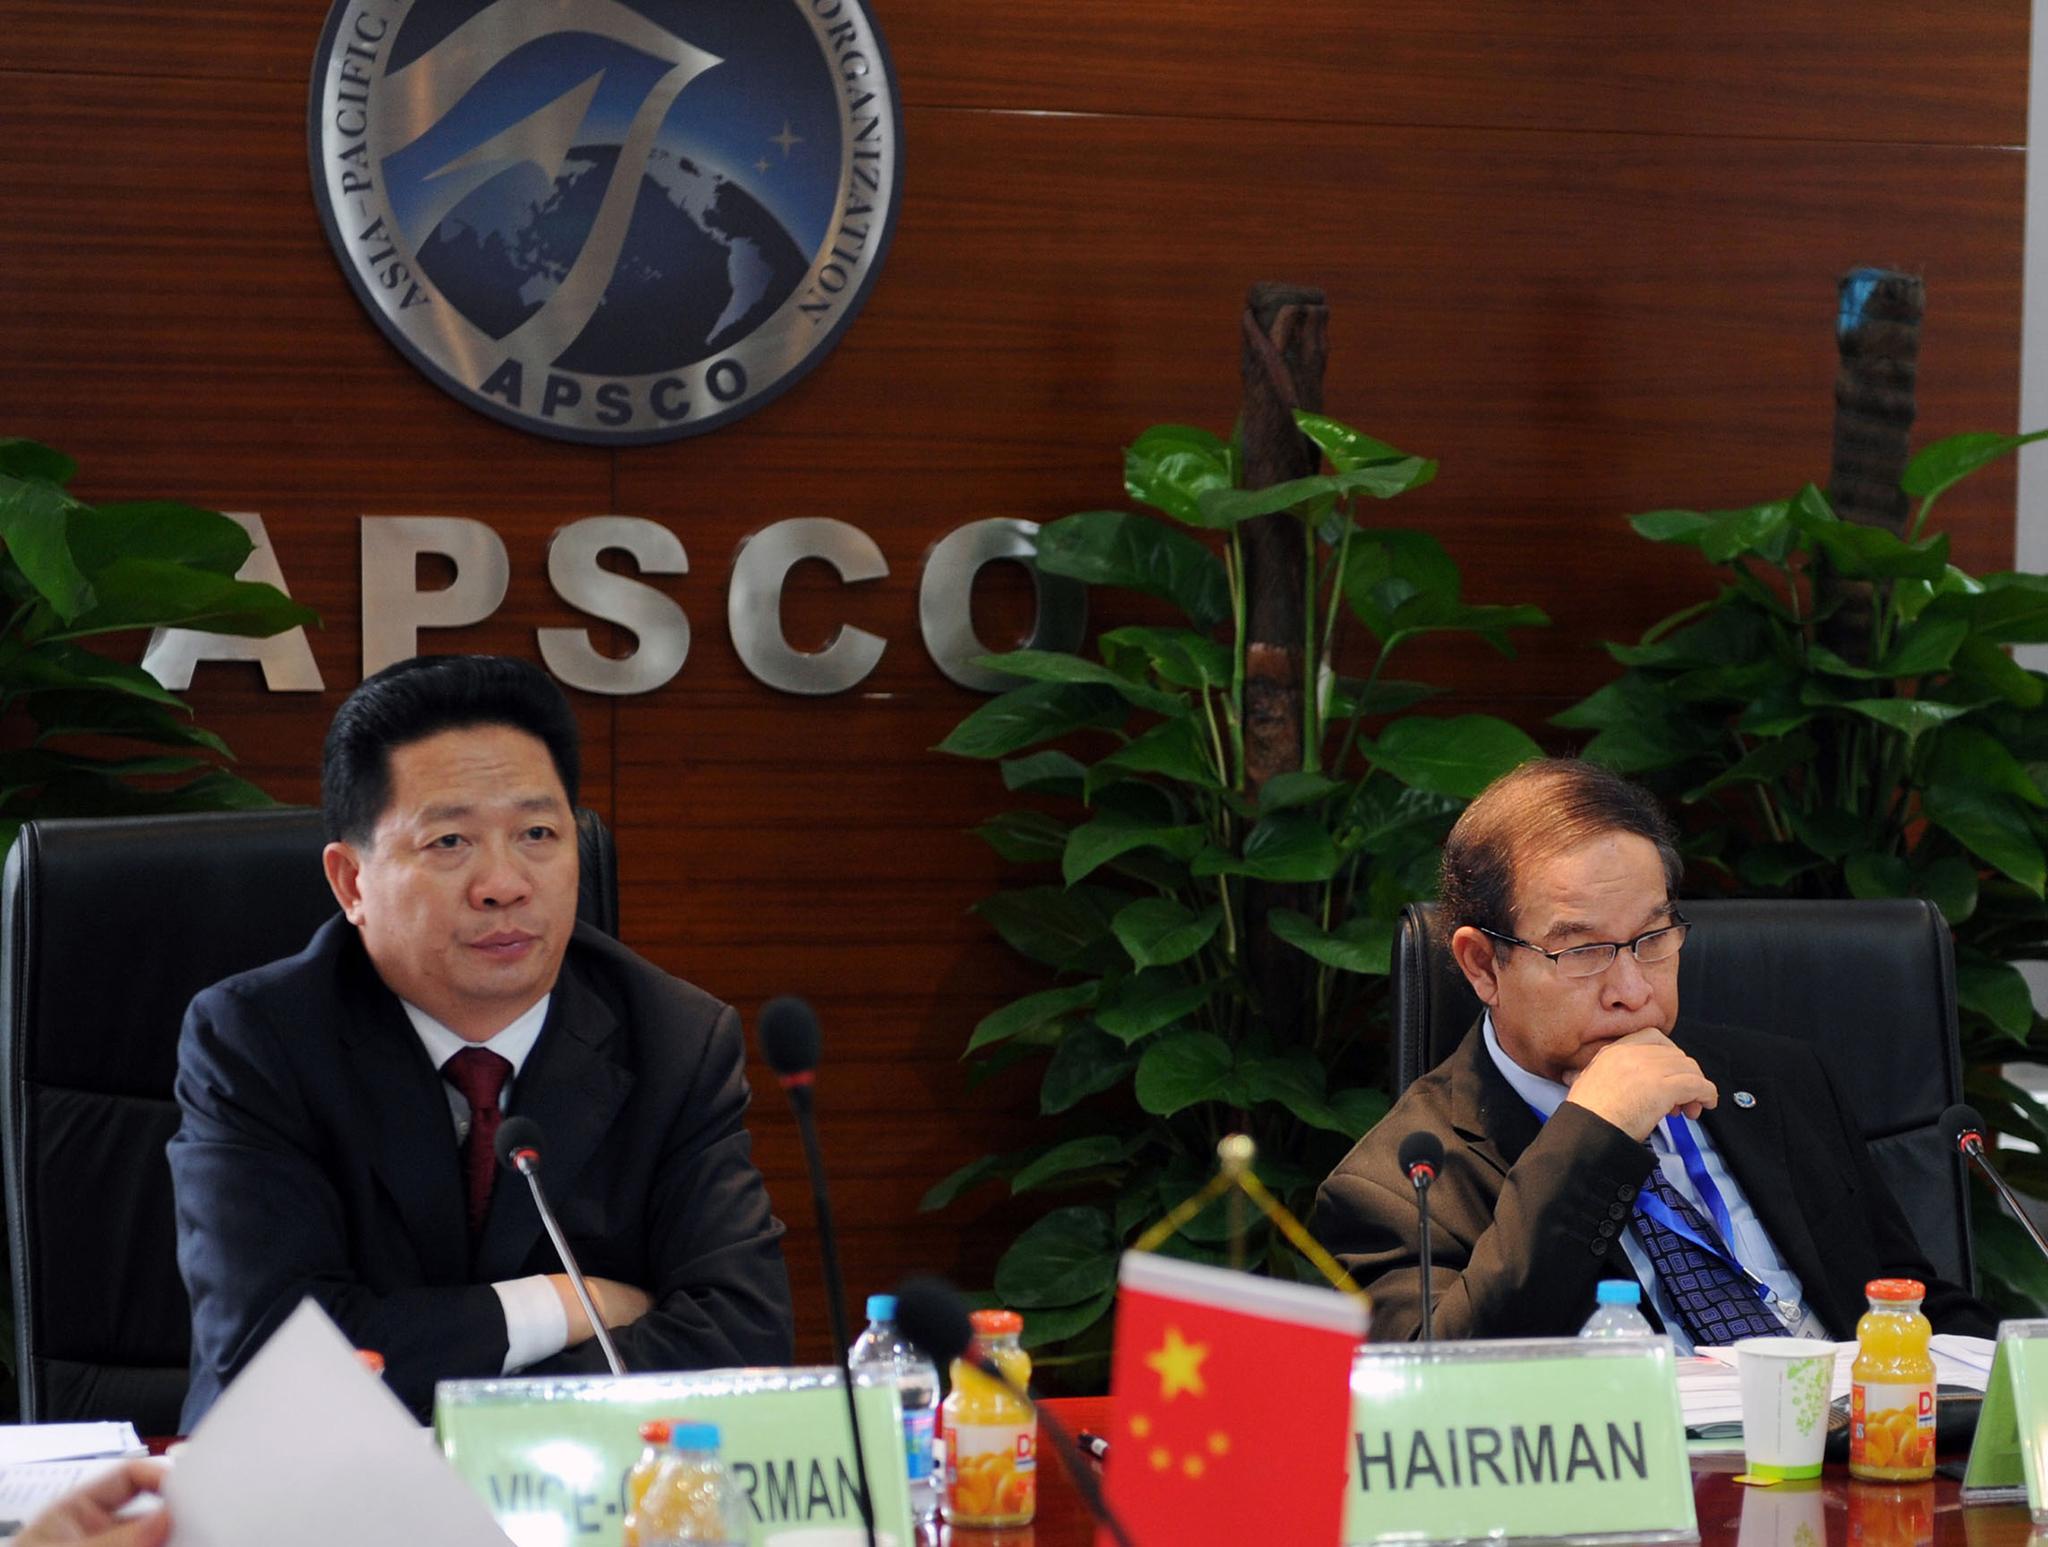 China | Governador de Liaoning admite ter adulterado dados económicos